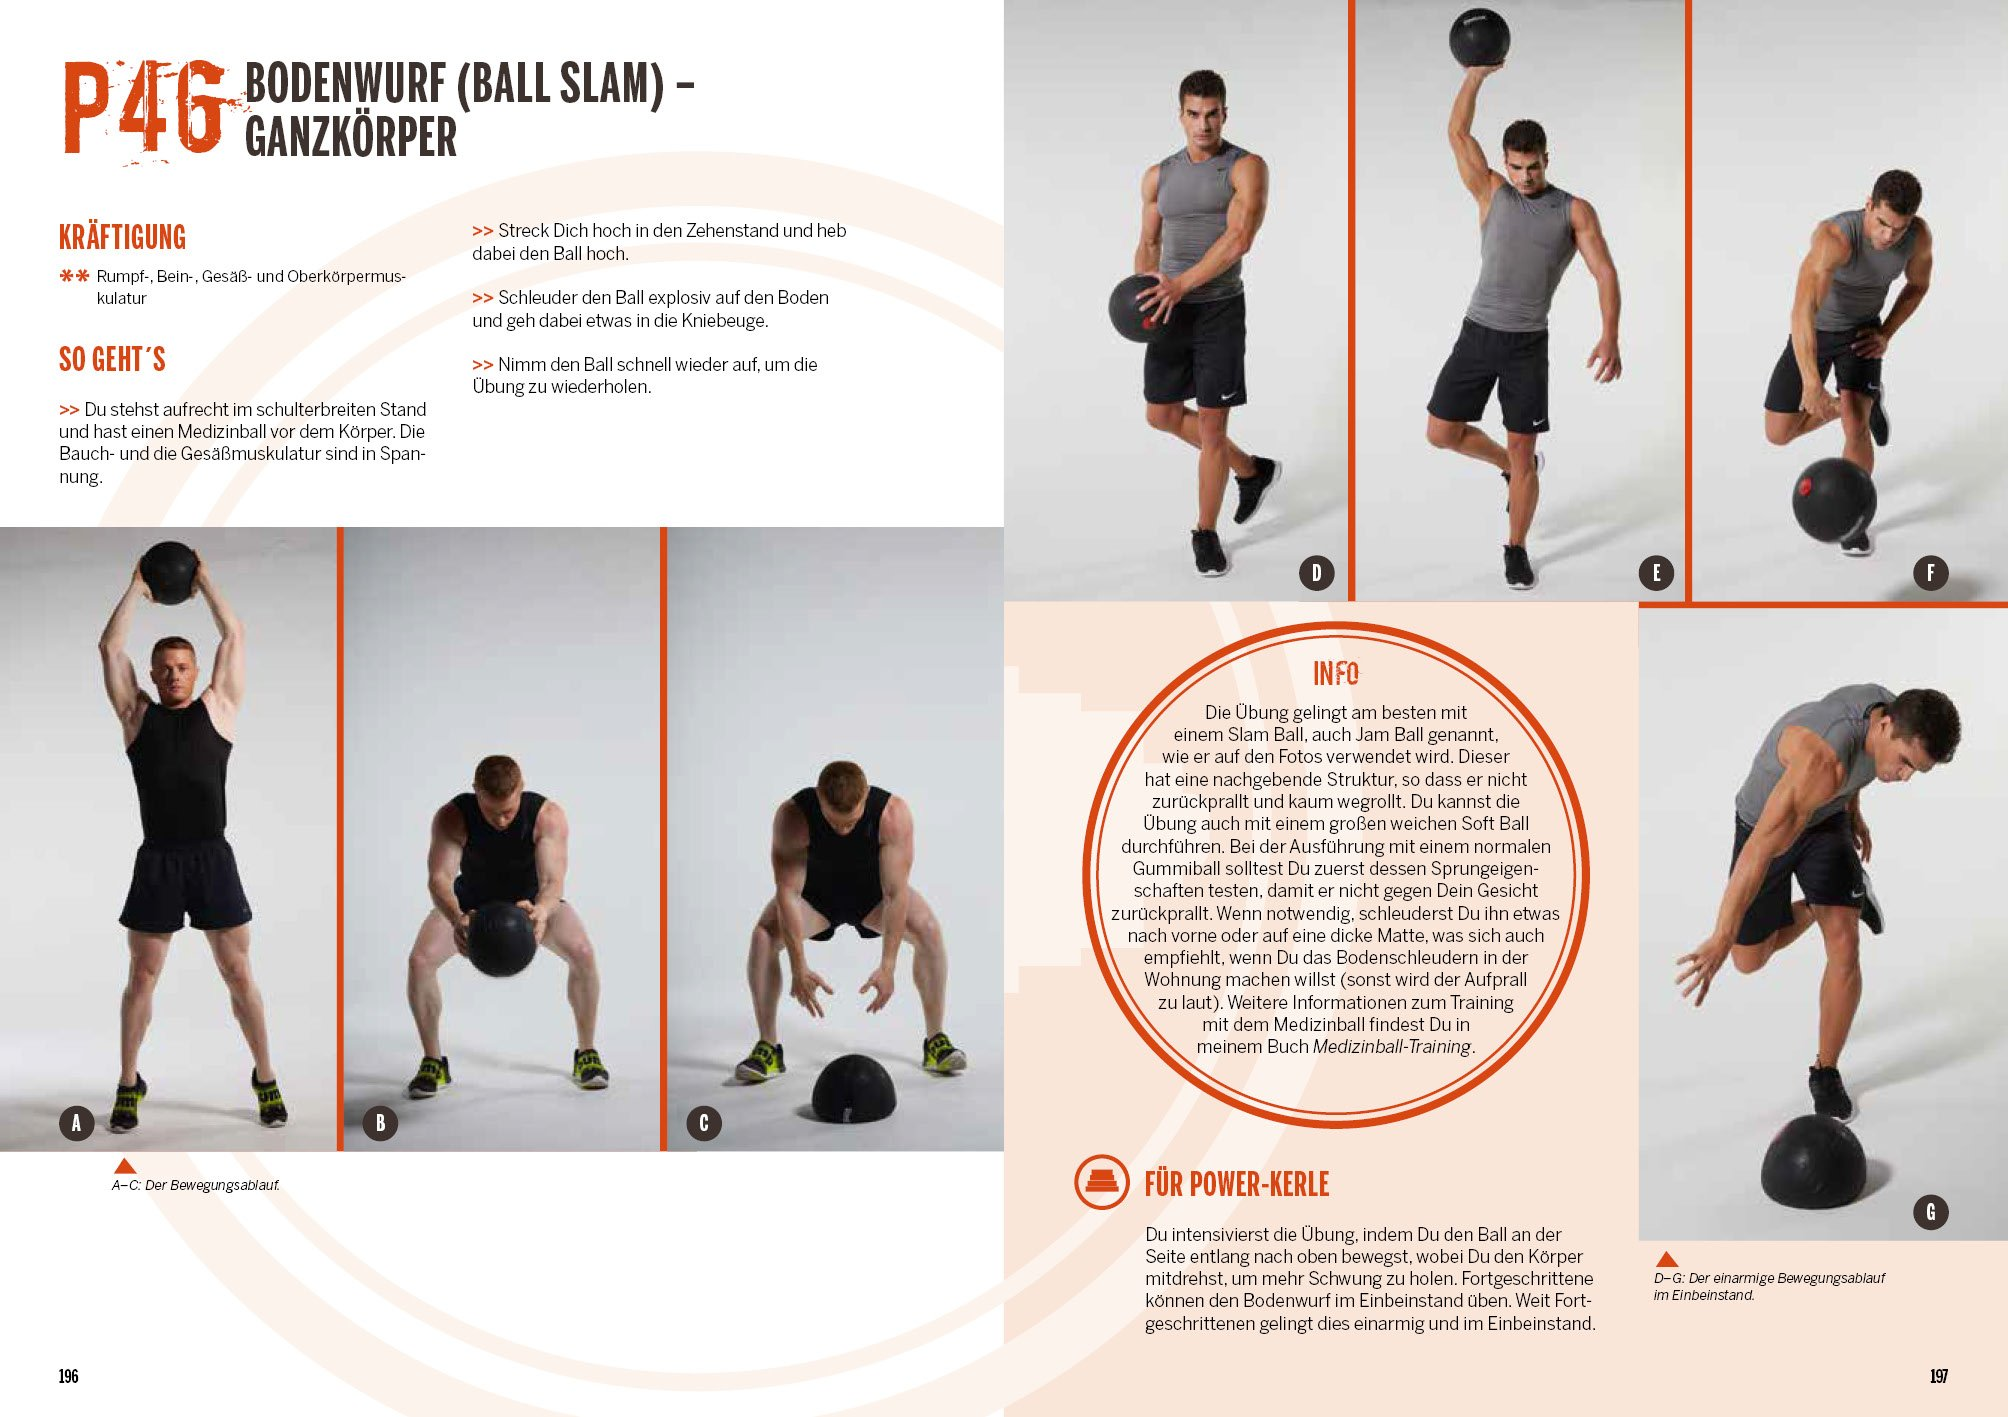 der ultimative Trainings-Guide Krafttraining-Buch Power für echte Kerle DMAX